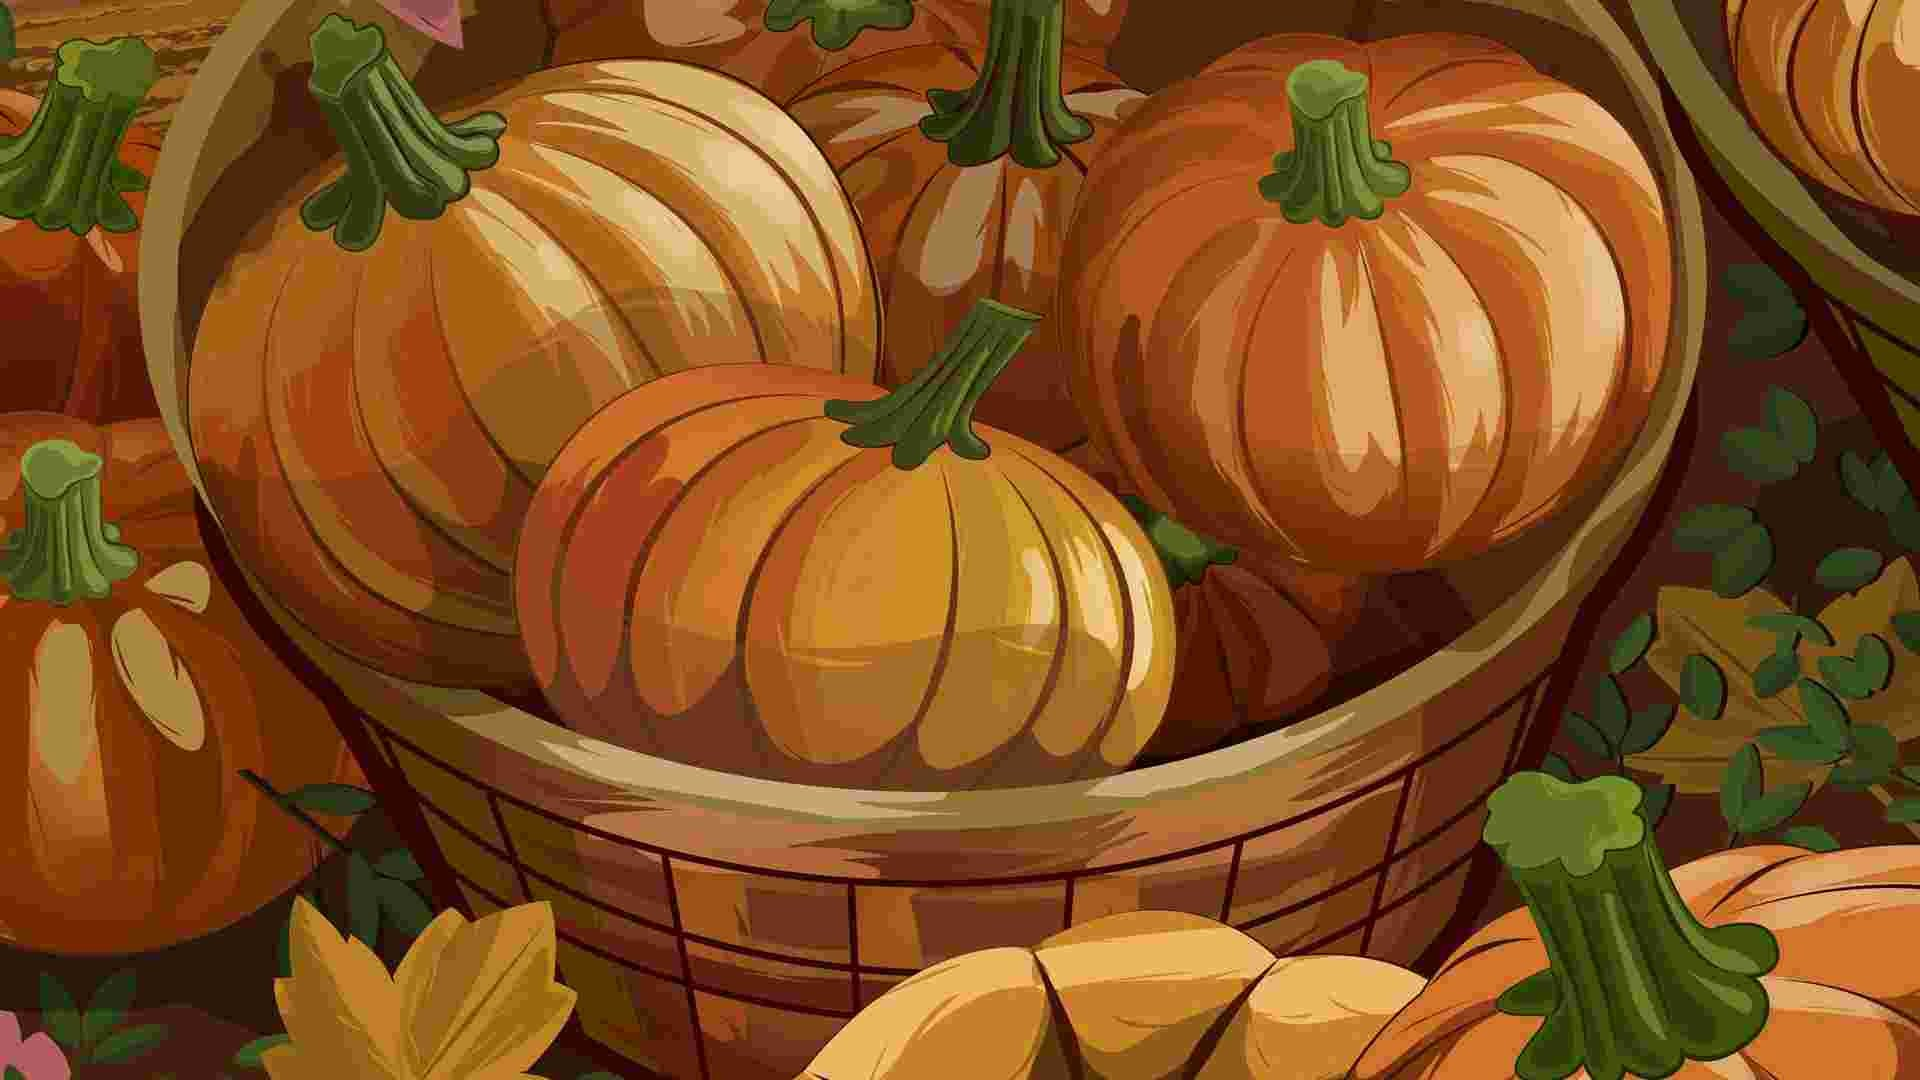 fall pumpkin wallpaper high resolution – photo #30. Halloween Full HD 28.  Обои – Хэллоуин (Halloween .